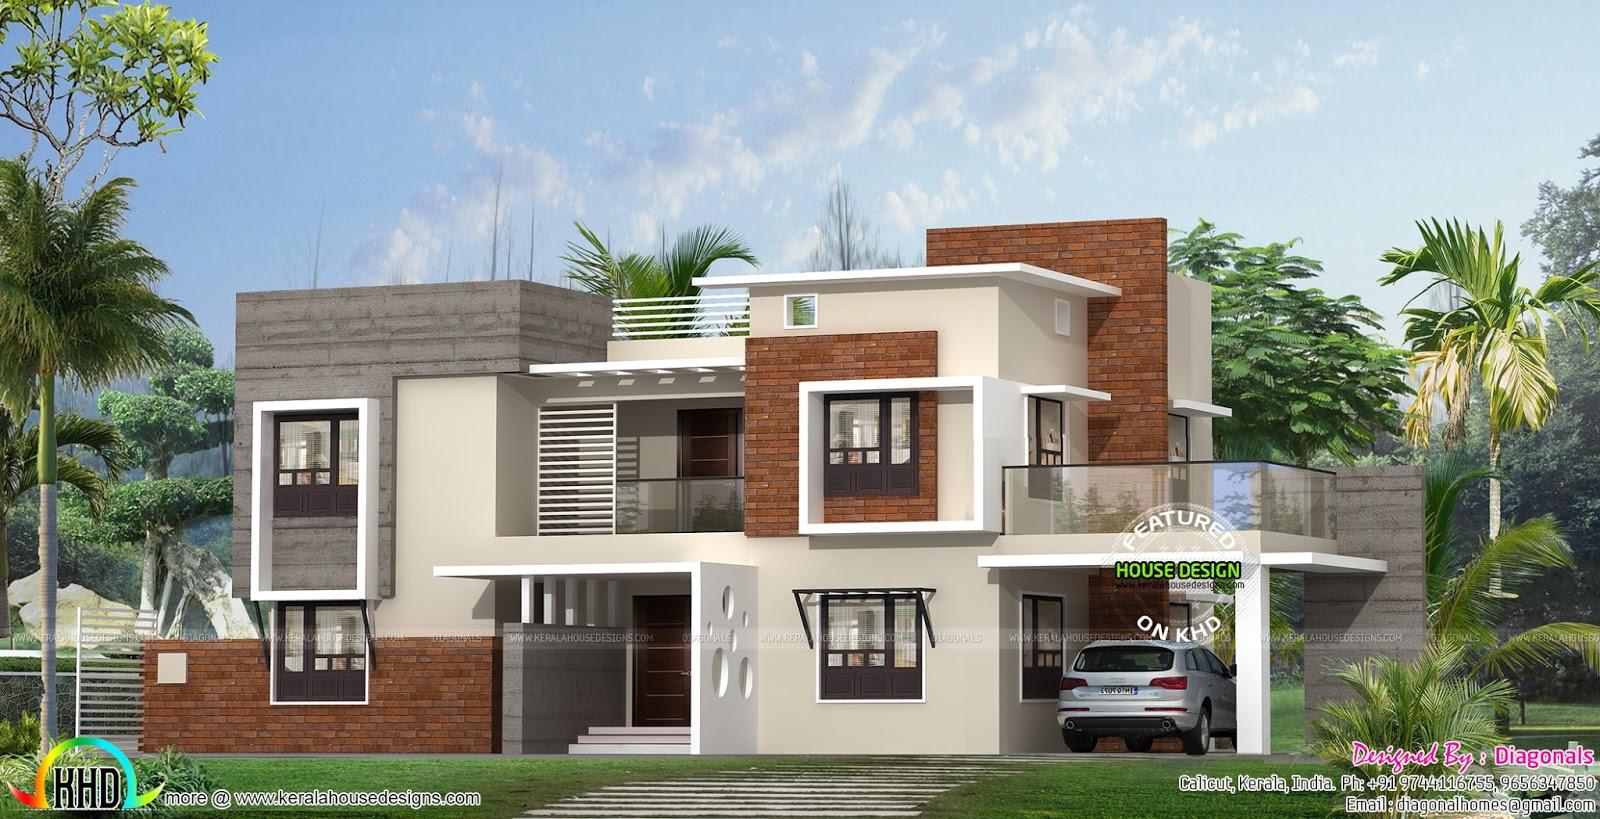 Box model modern flat roof home plan - Kerala home design ...